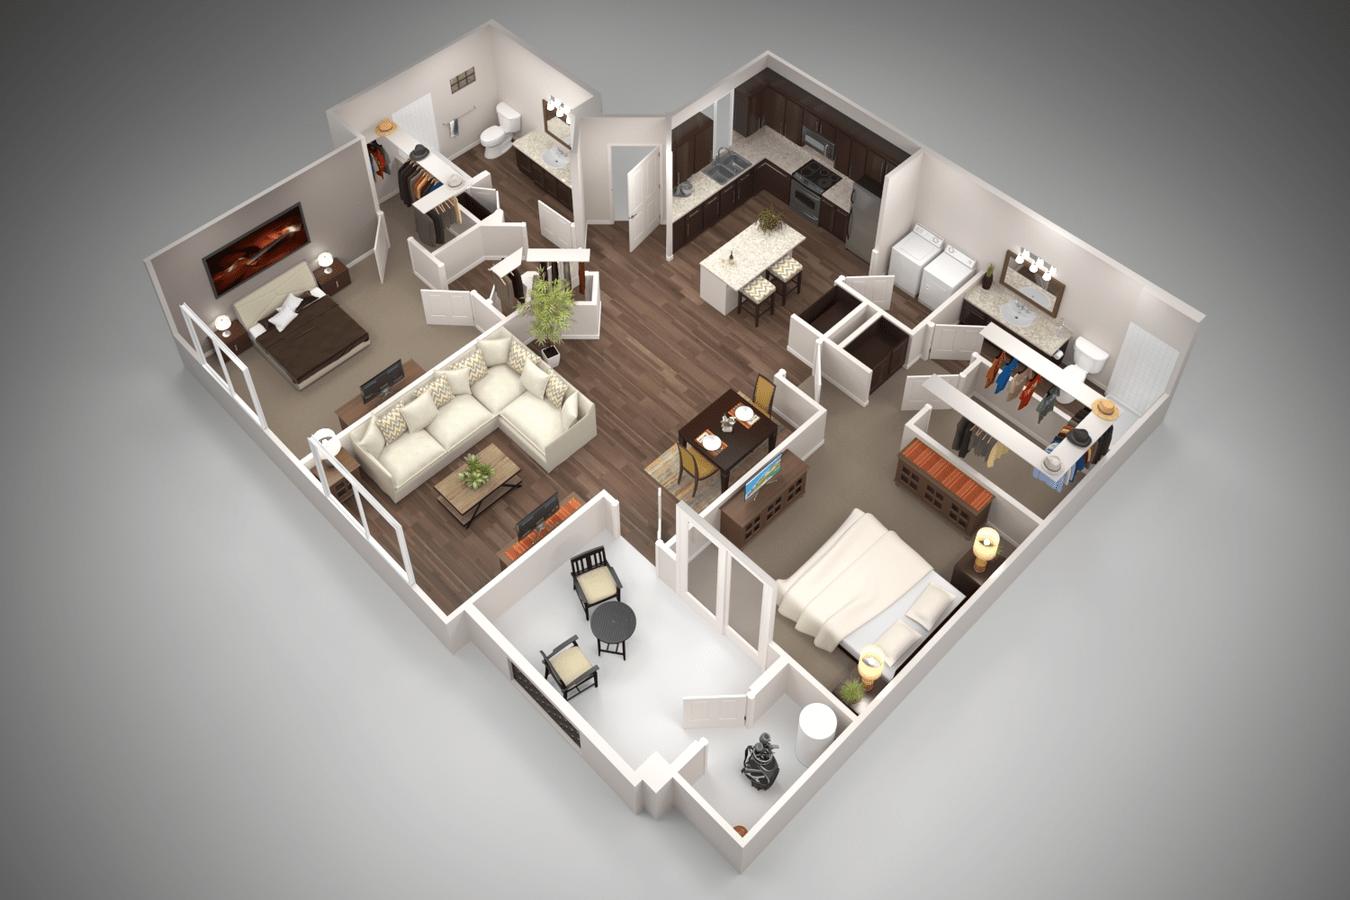 2 Bedrooms 2 Bathrooms Apartment for rent at San Piedra in Mesa, AZ